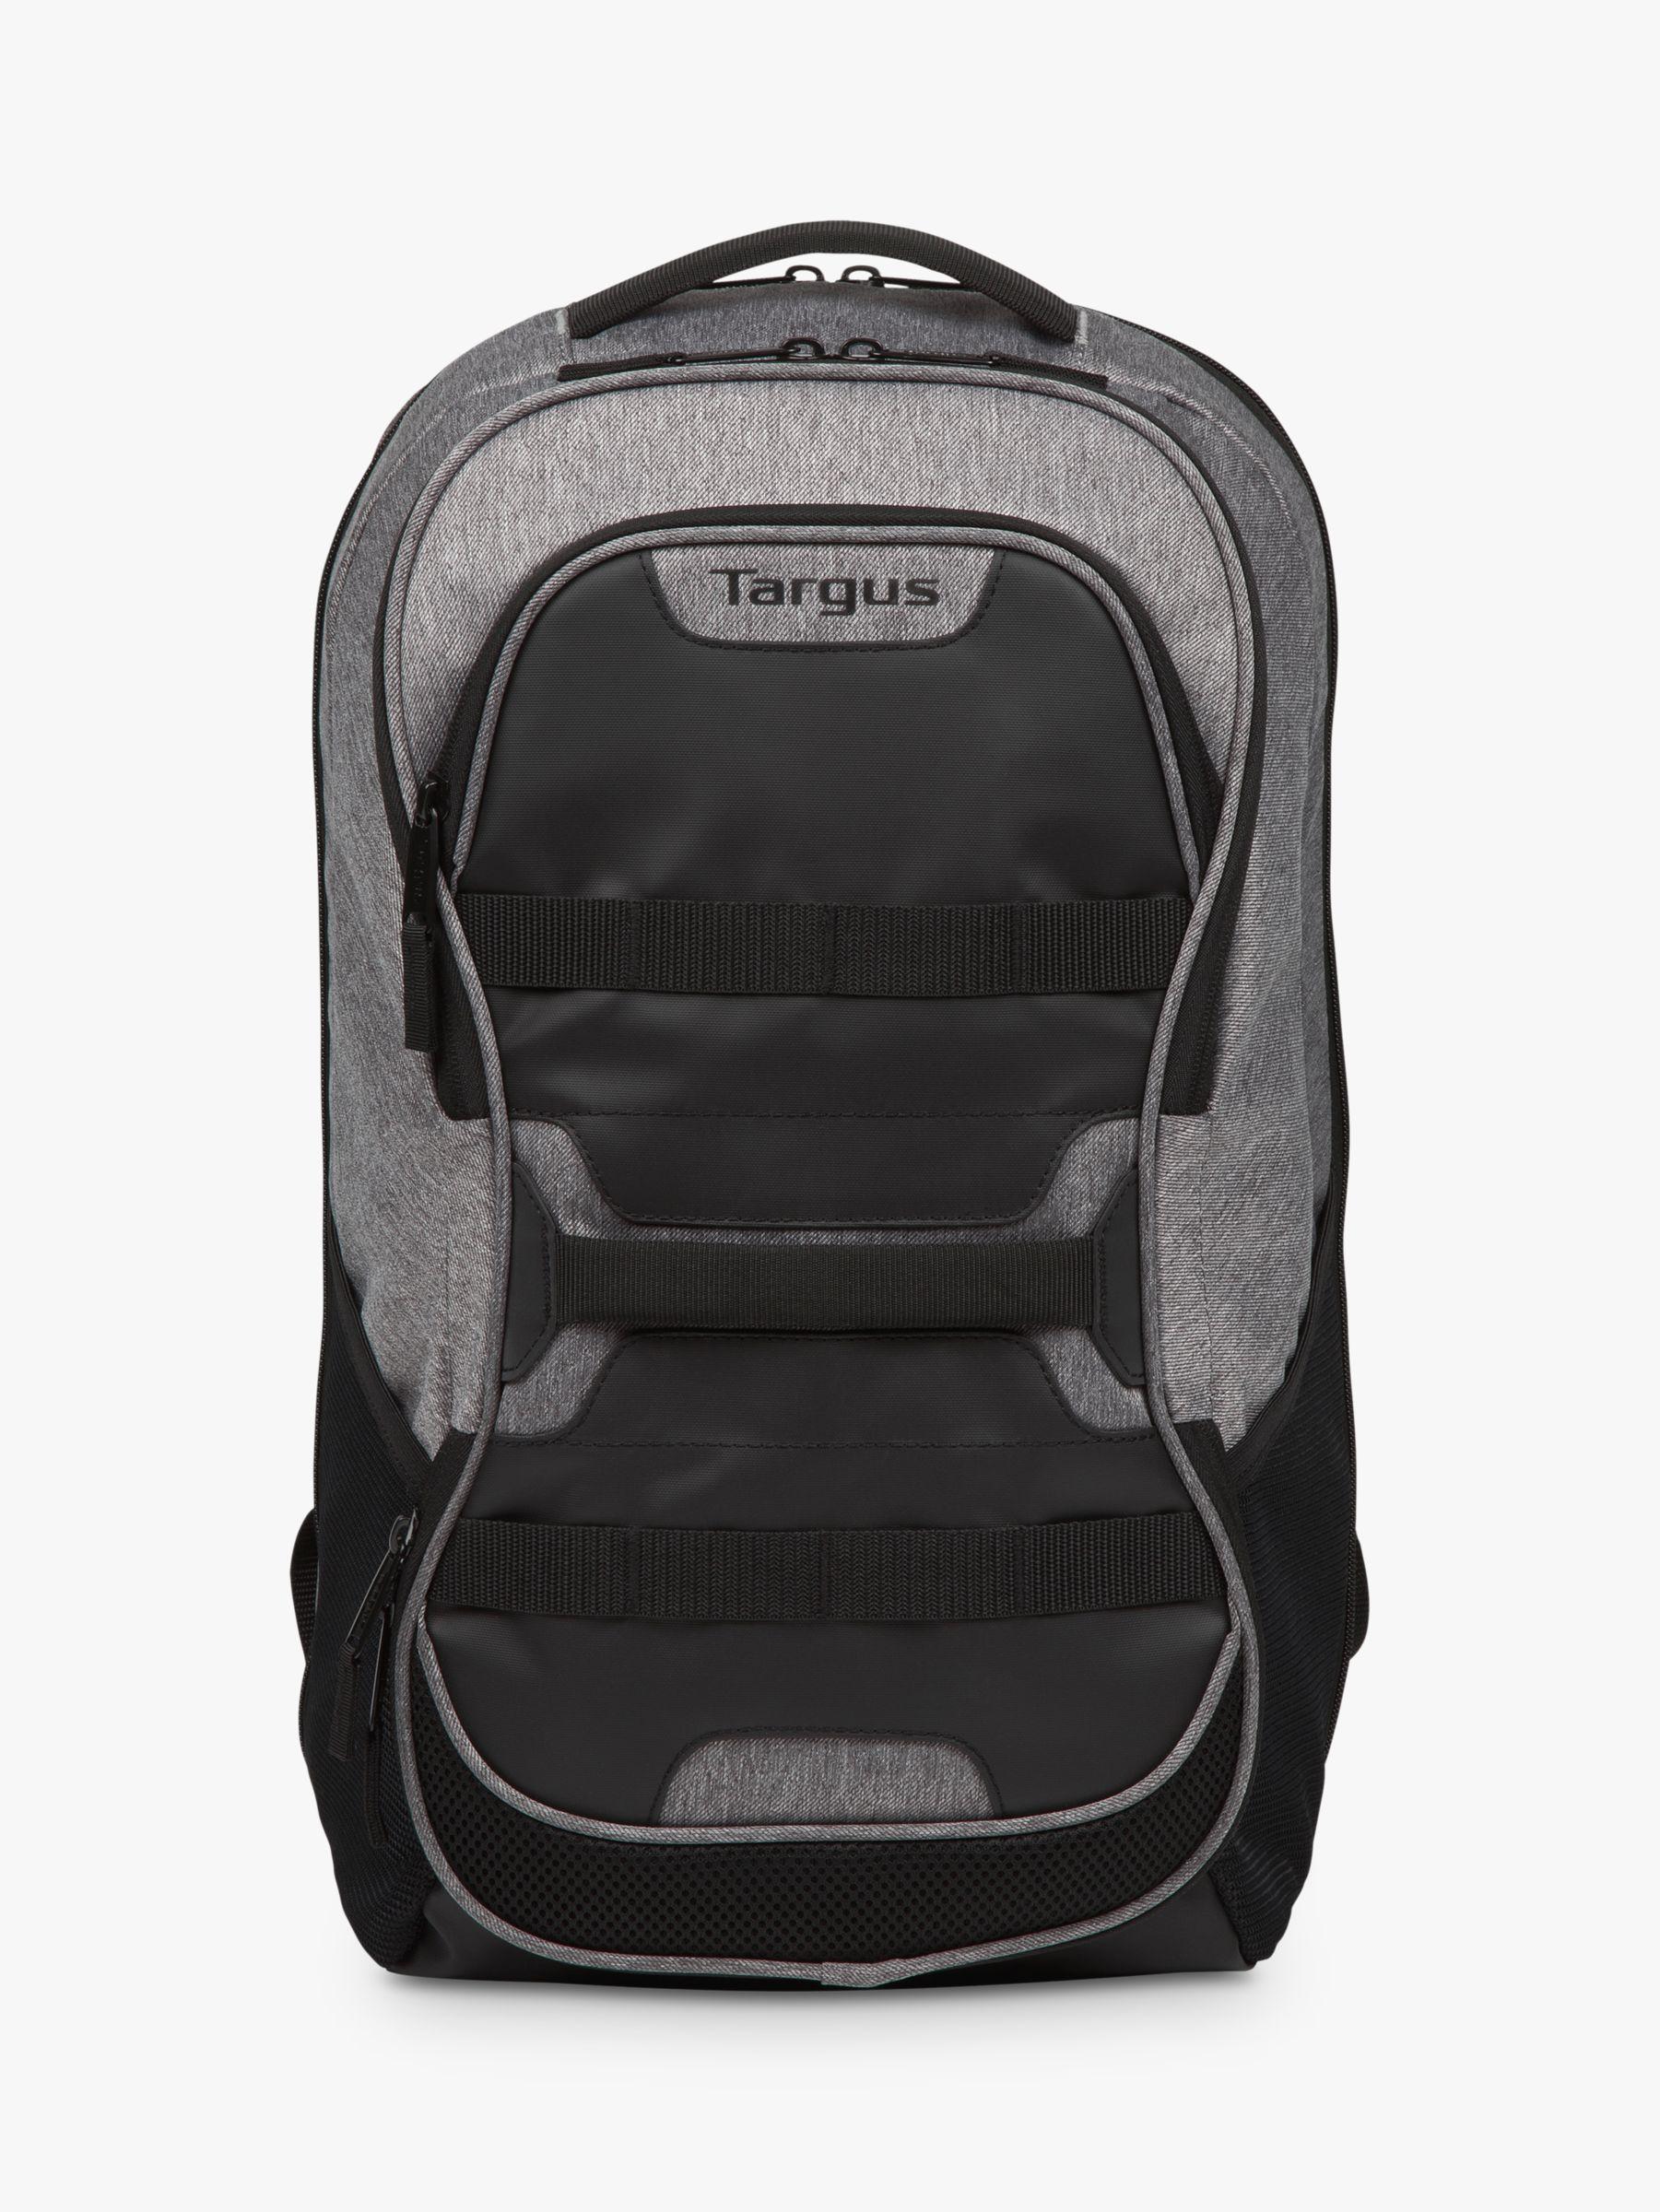 "Targus Targus Work + Play Fitness Backpack for Laptops up to 15.6"", Black/Grey"